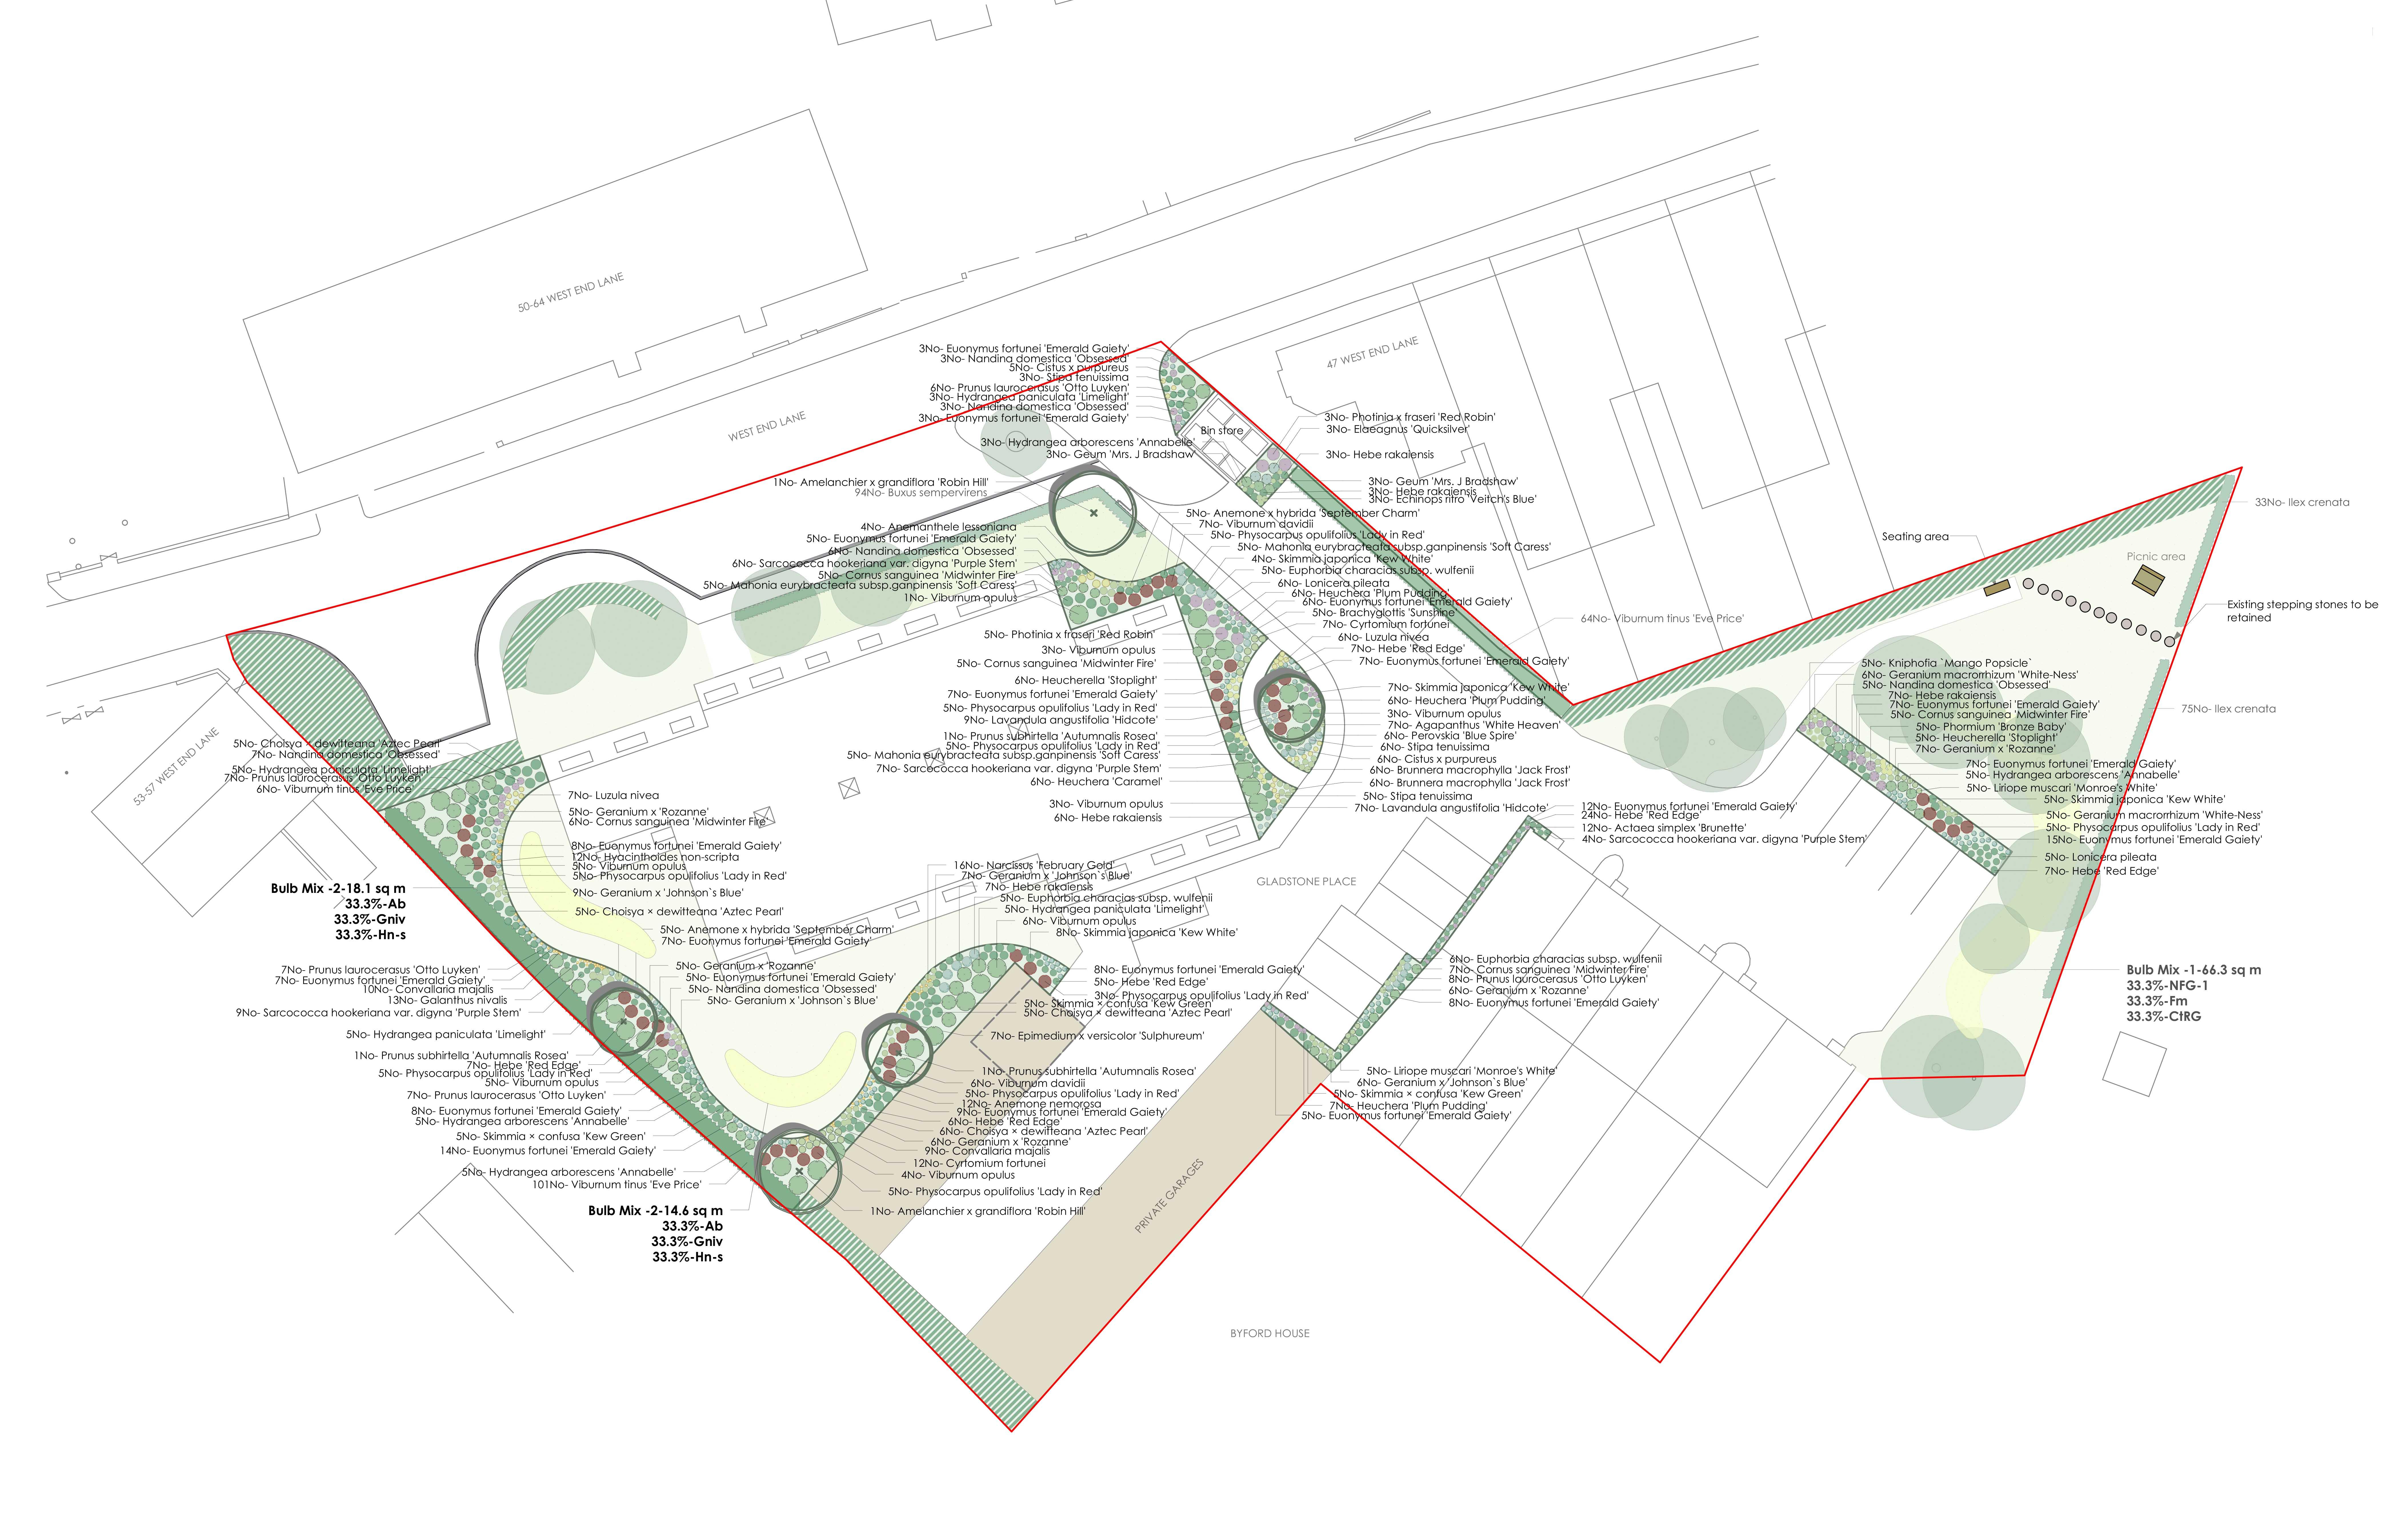 1808-GUA-DR-L002-P01 Planting Plan